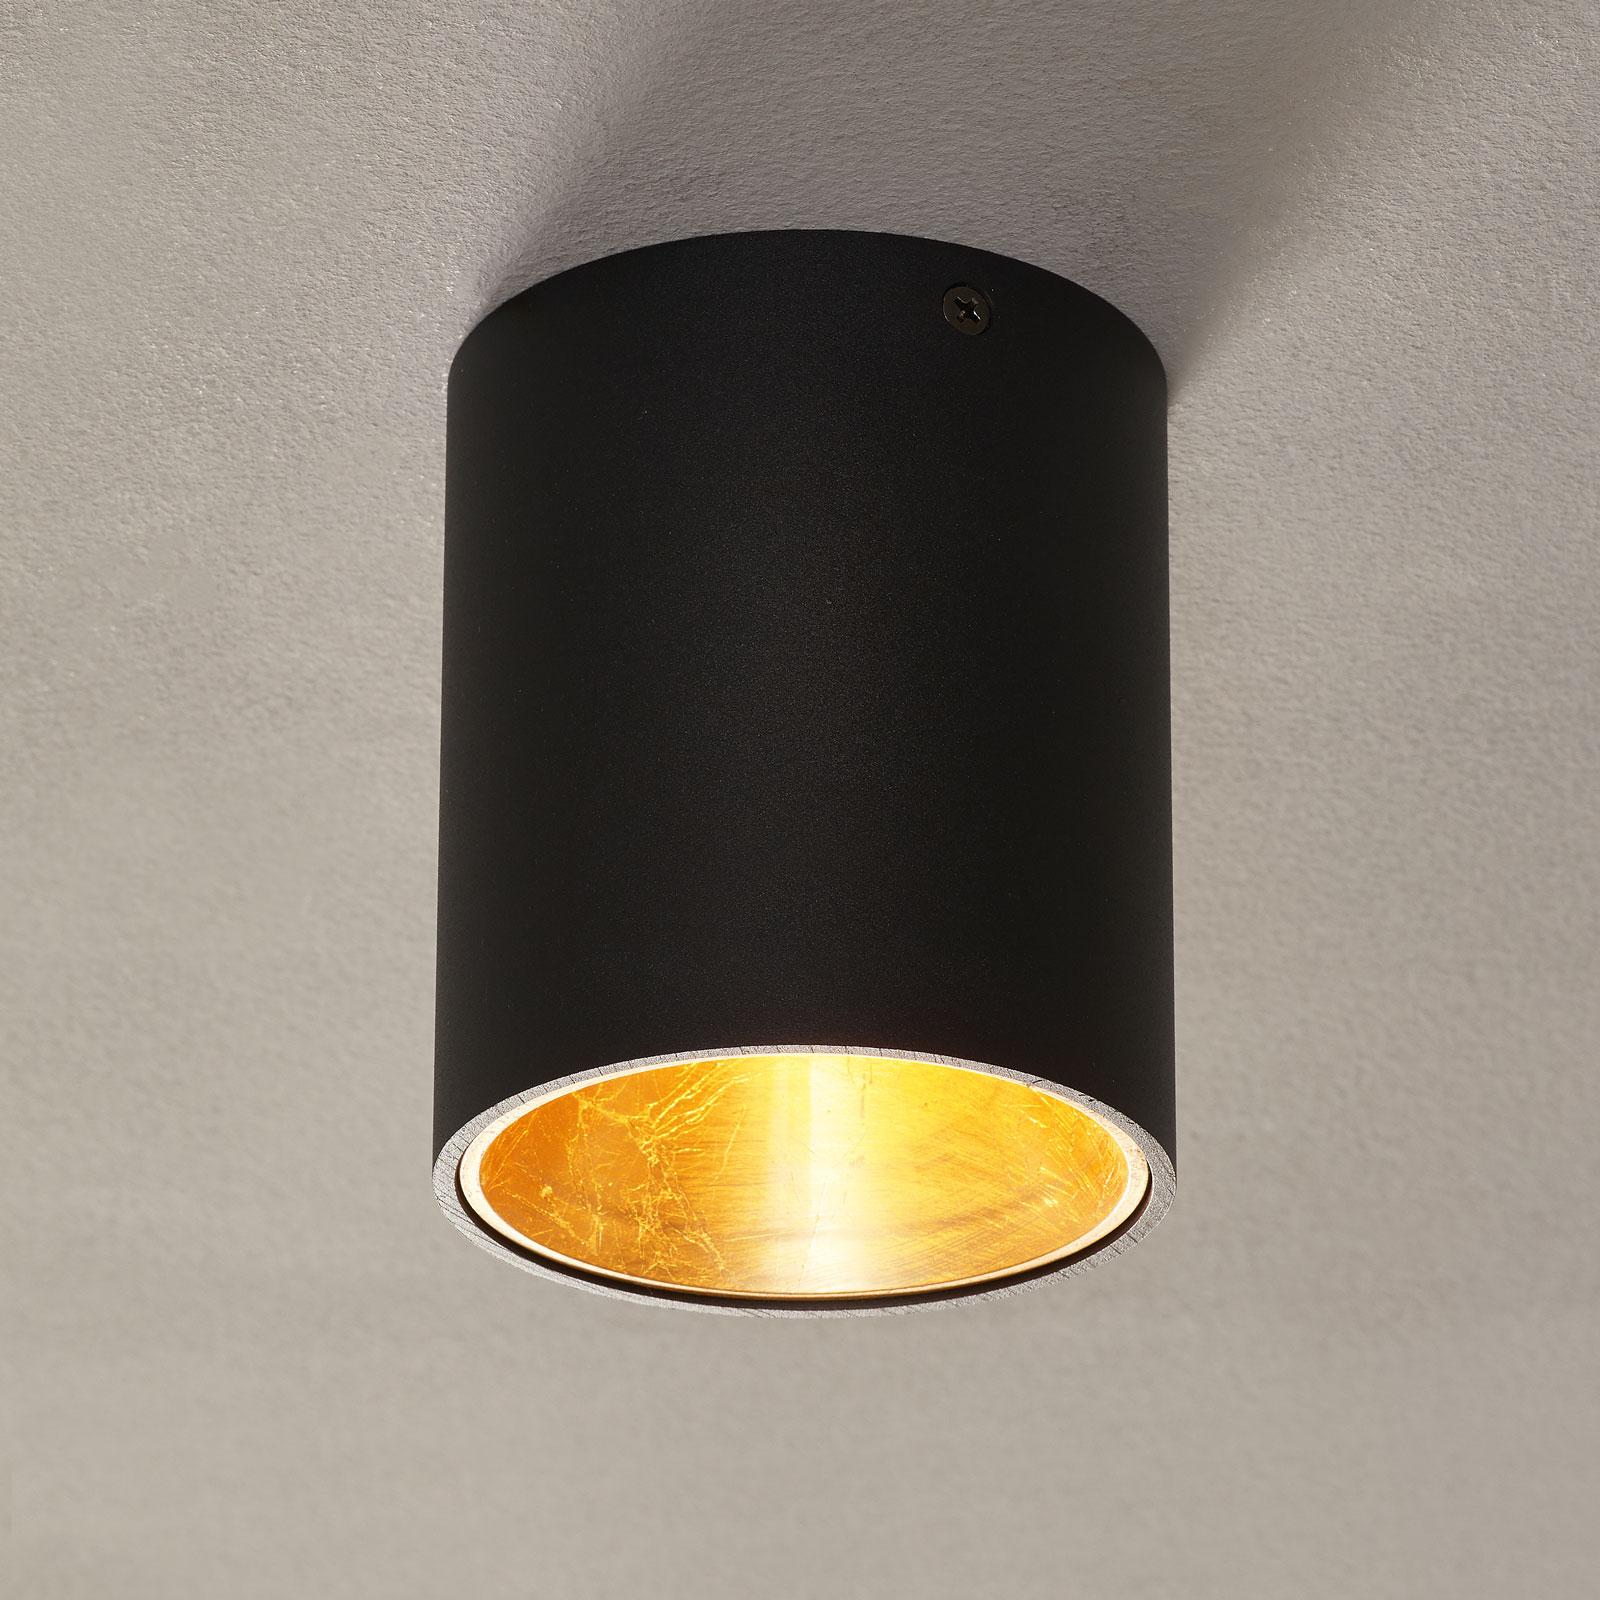 LED plafondlamp Polasso rond, zwart-goud